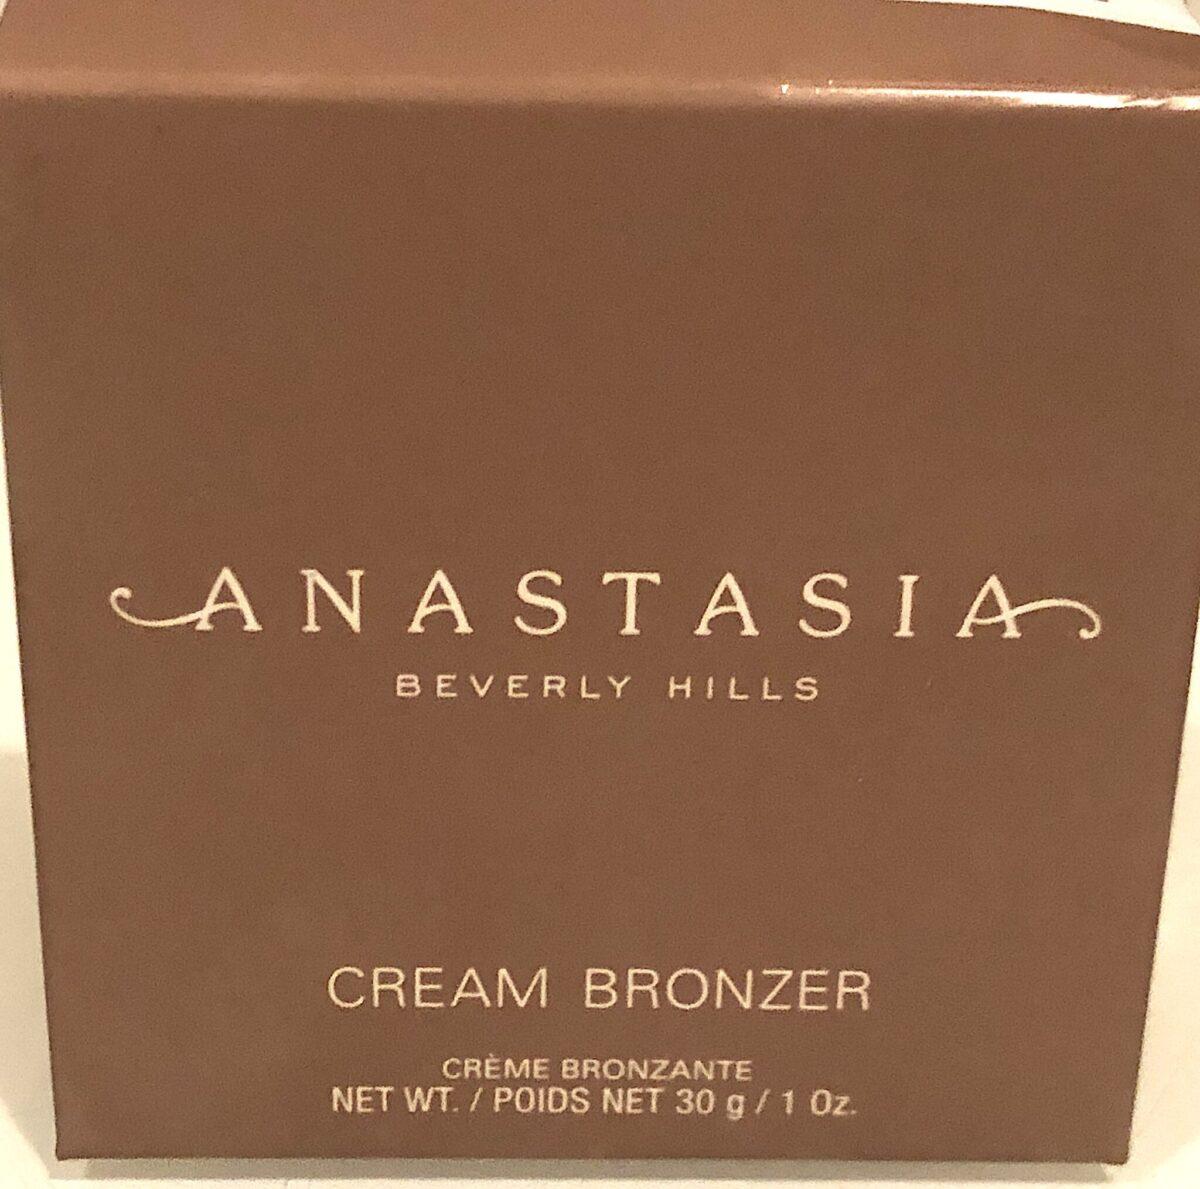 Anastasia New Cream Bronzer outer box